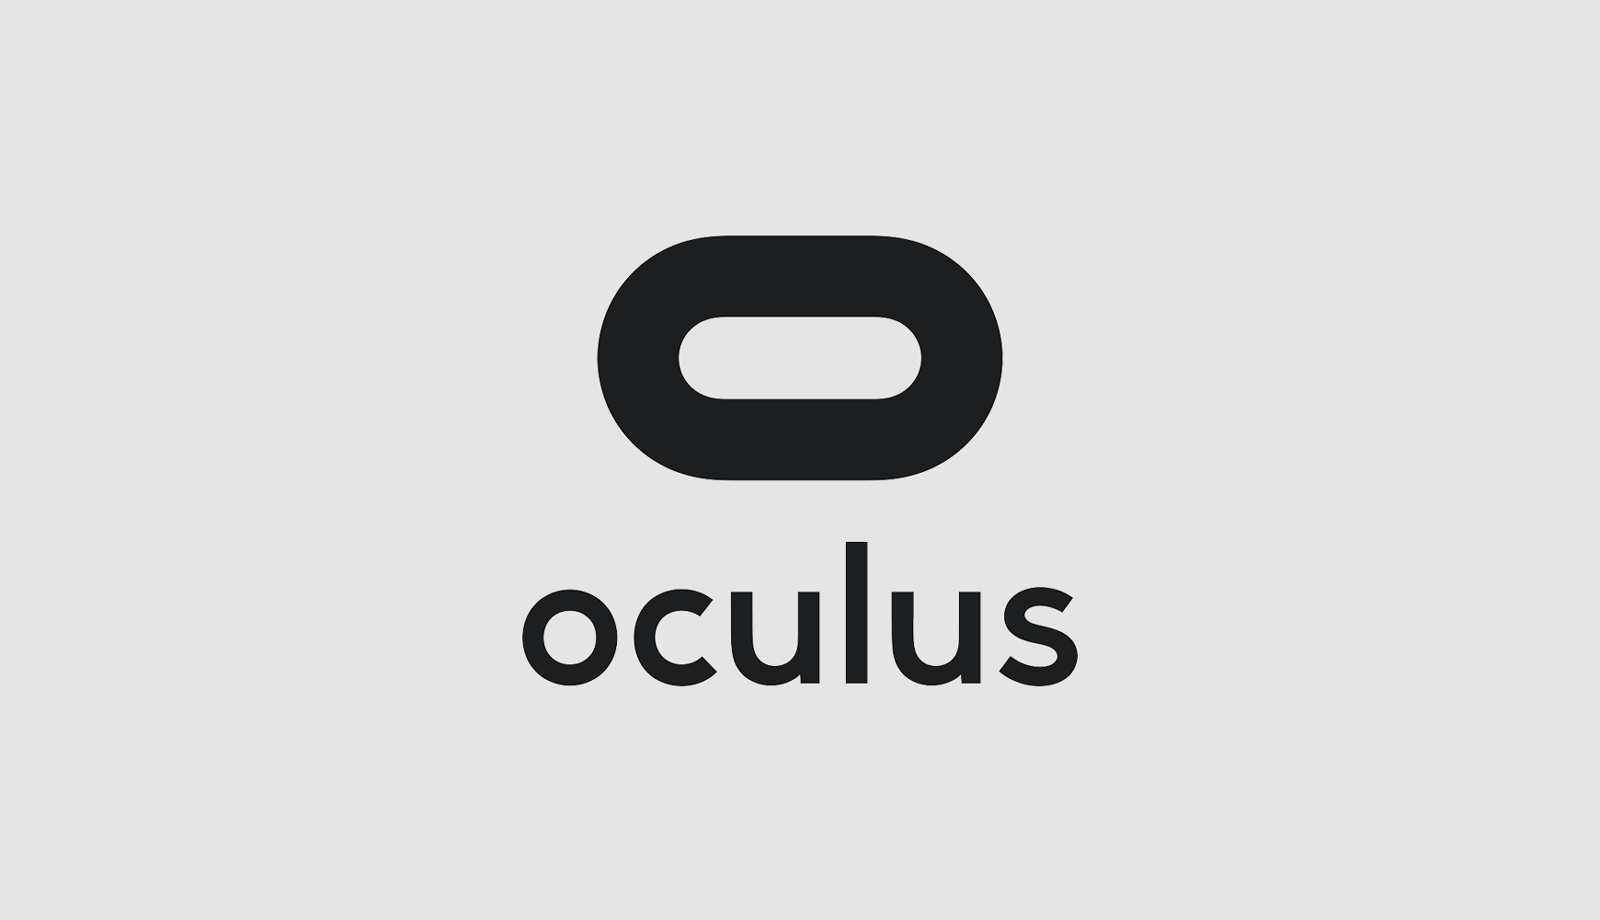 oculus_img_1